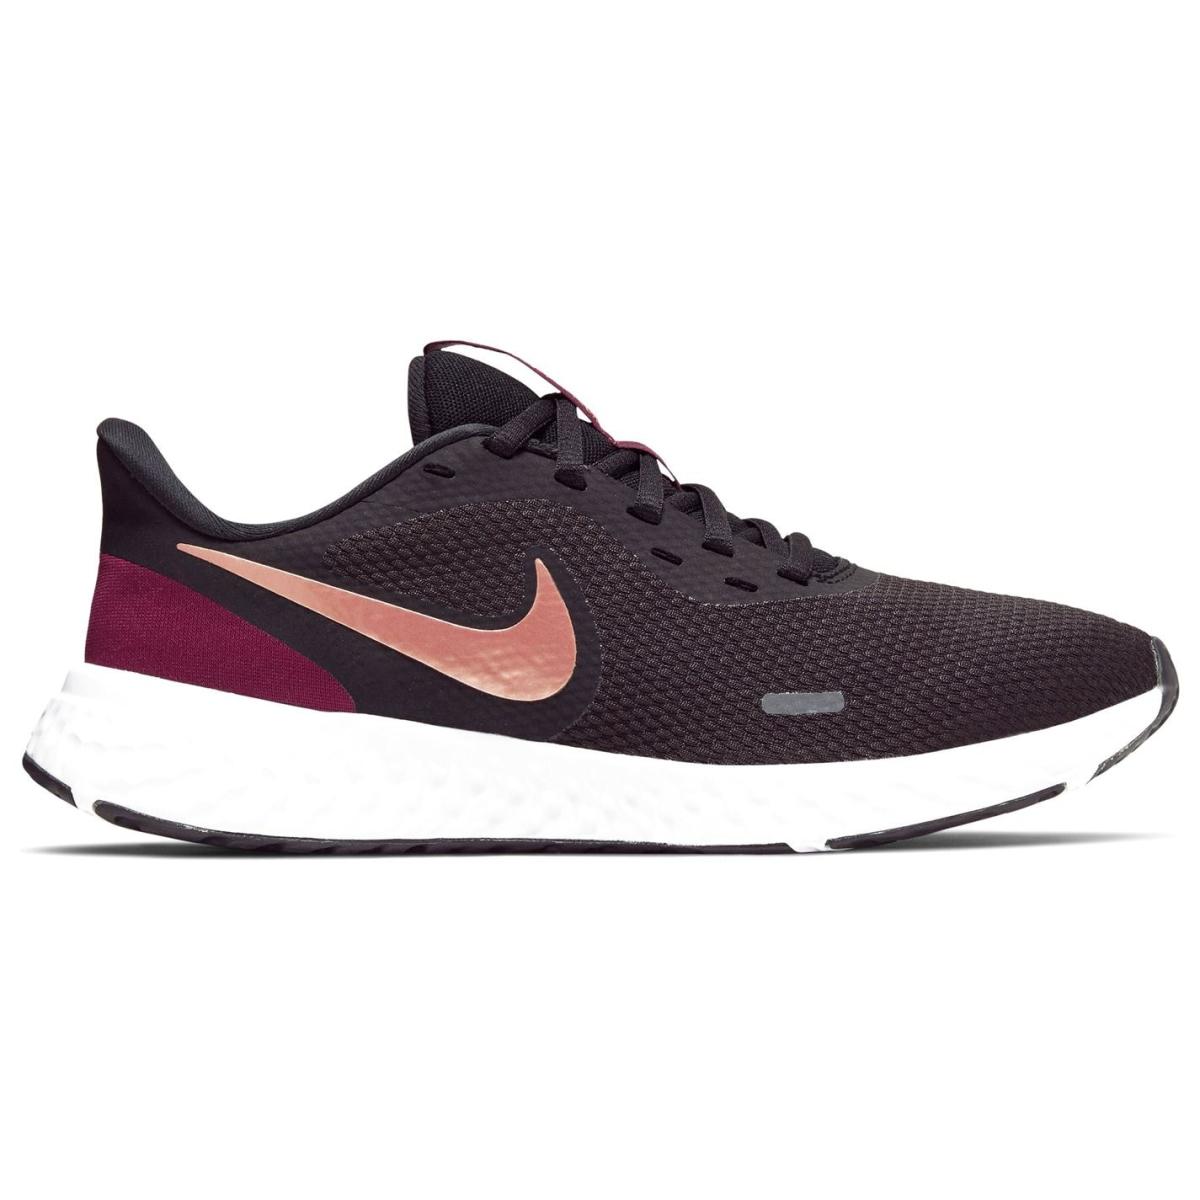 Nike-Revolution-Turnschuhe-Damen-Sneaker-Sportschuhe-Laufschuhe-1160 Indexbild 5